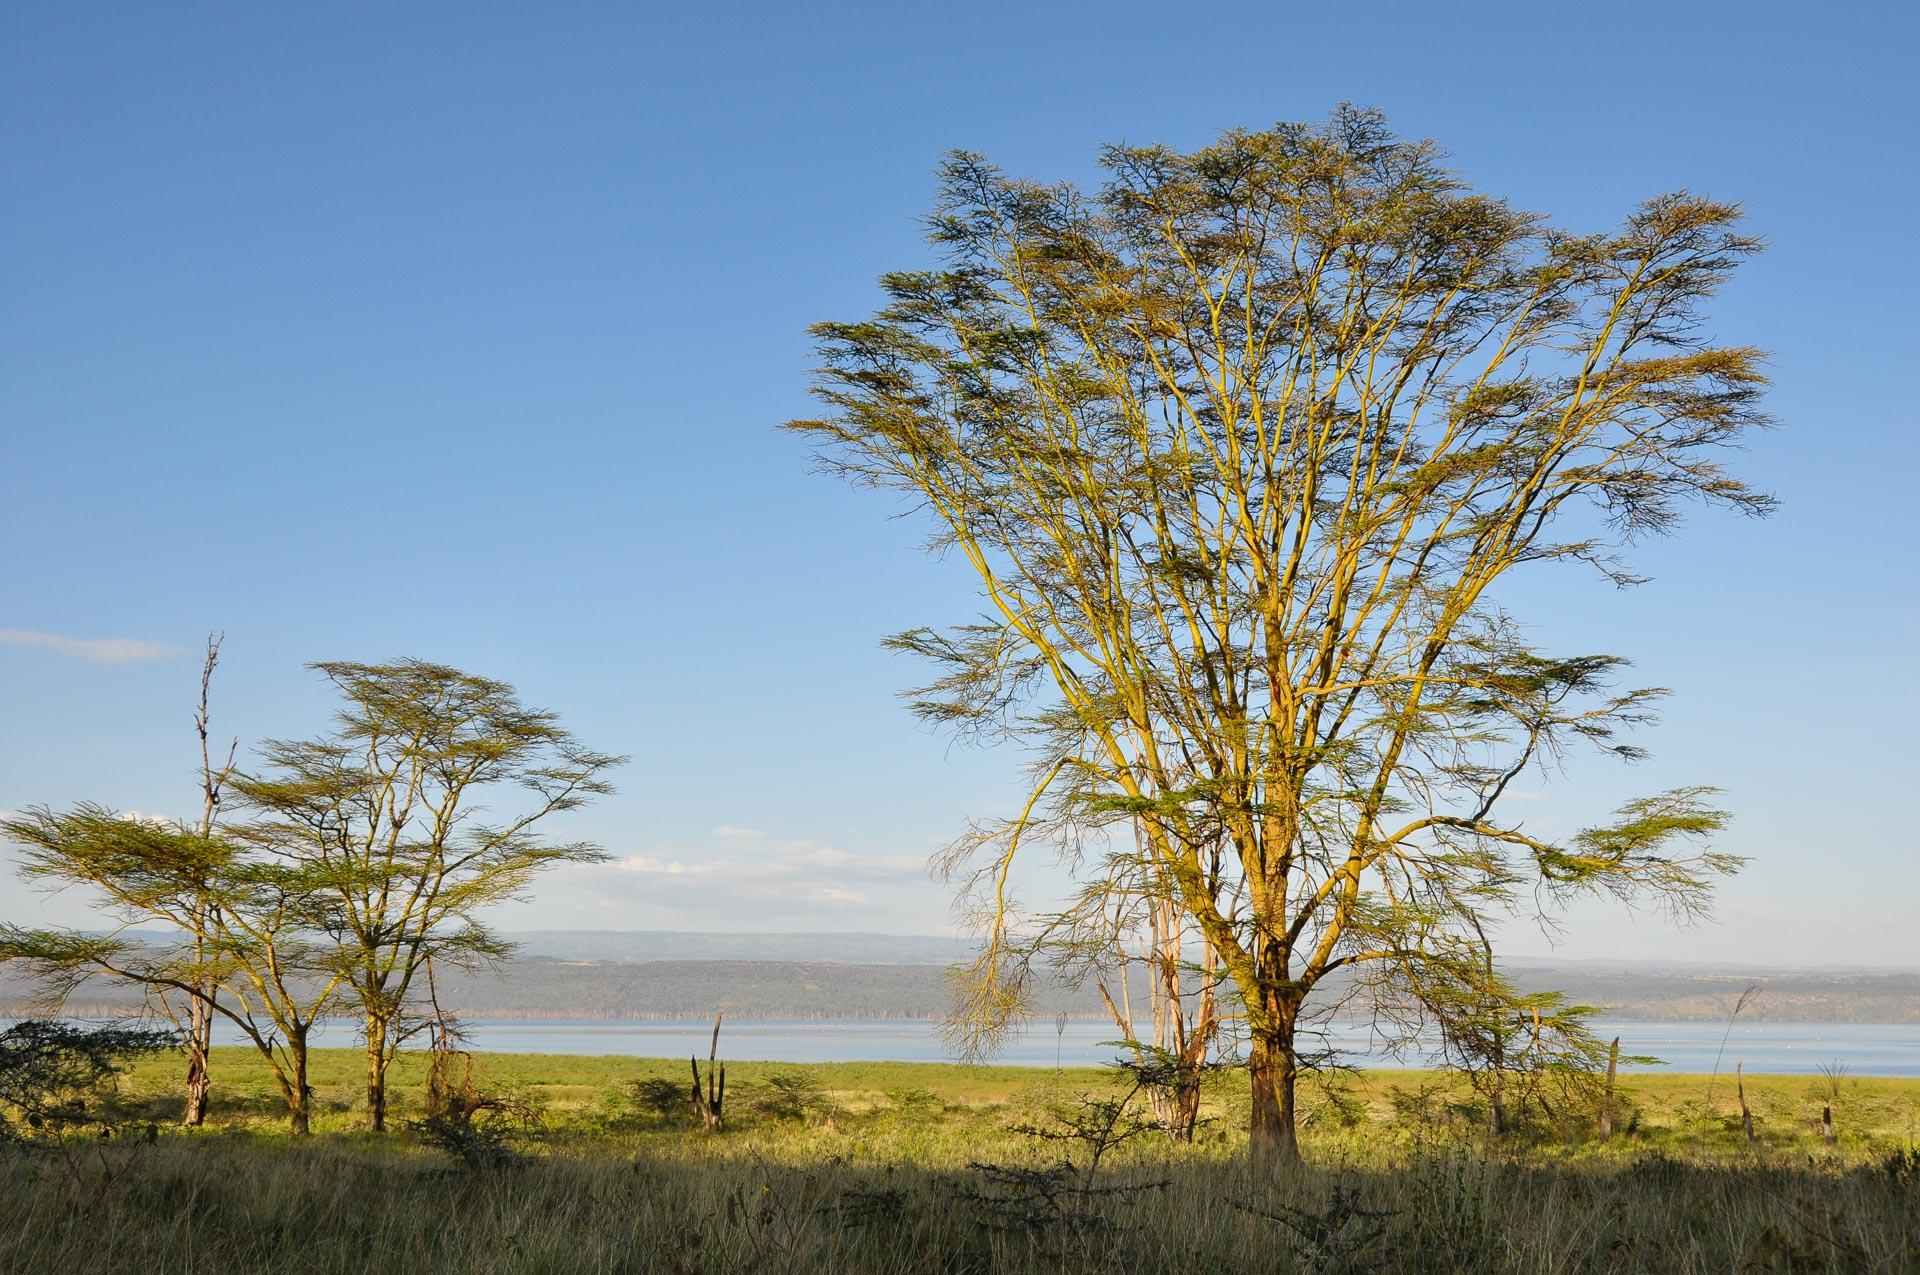 Lake-Nakuru-Nationalpark-Kenia-Globetrotter-Select-3